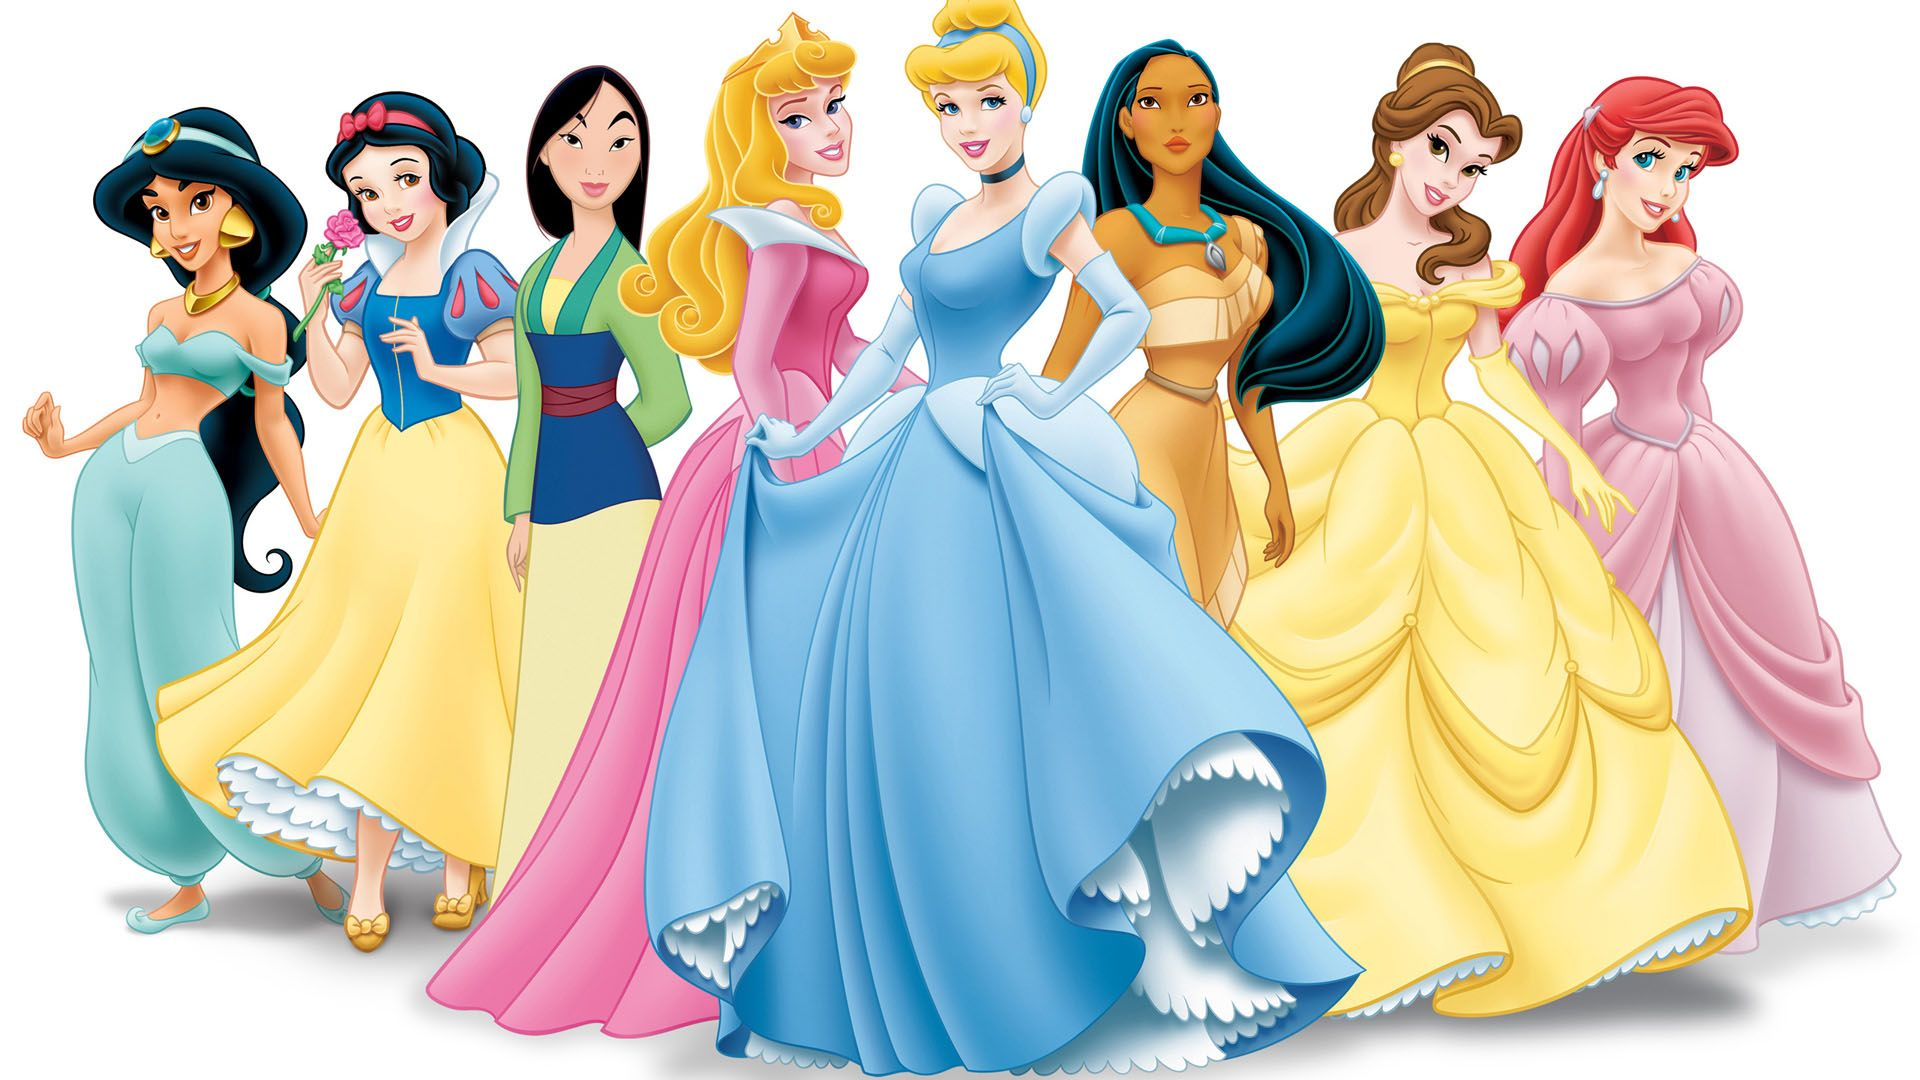 Download Disney Princess 1920x1080 Hd 1080p Wallpapers All Disney Princesses Disney Princess Wallpaper Original Disney Princesses